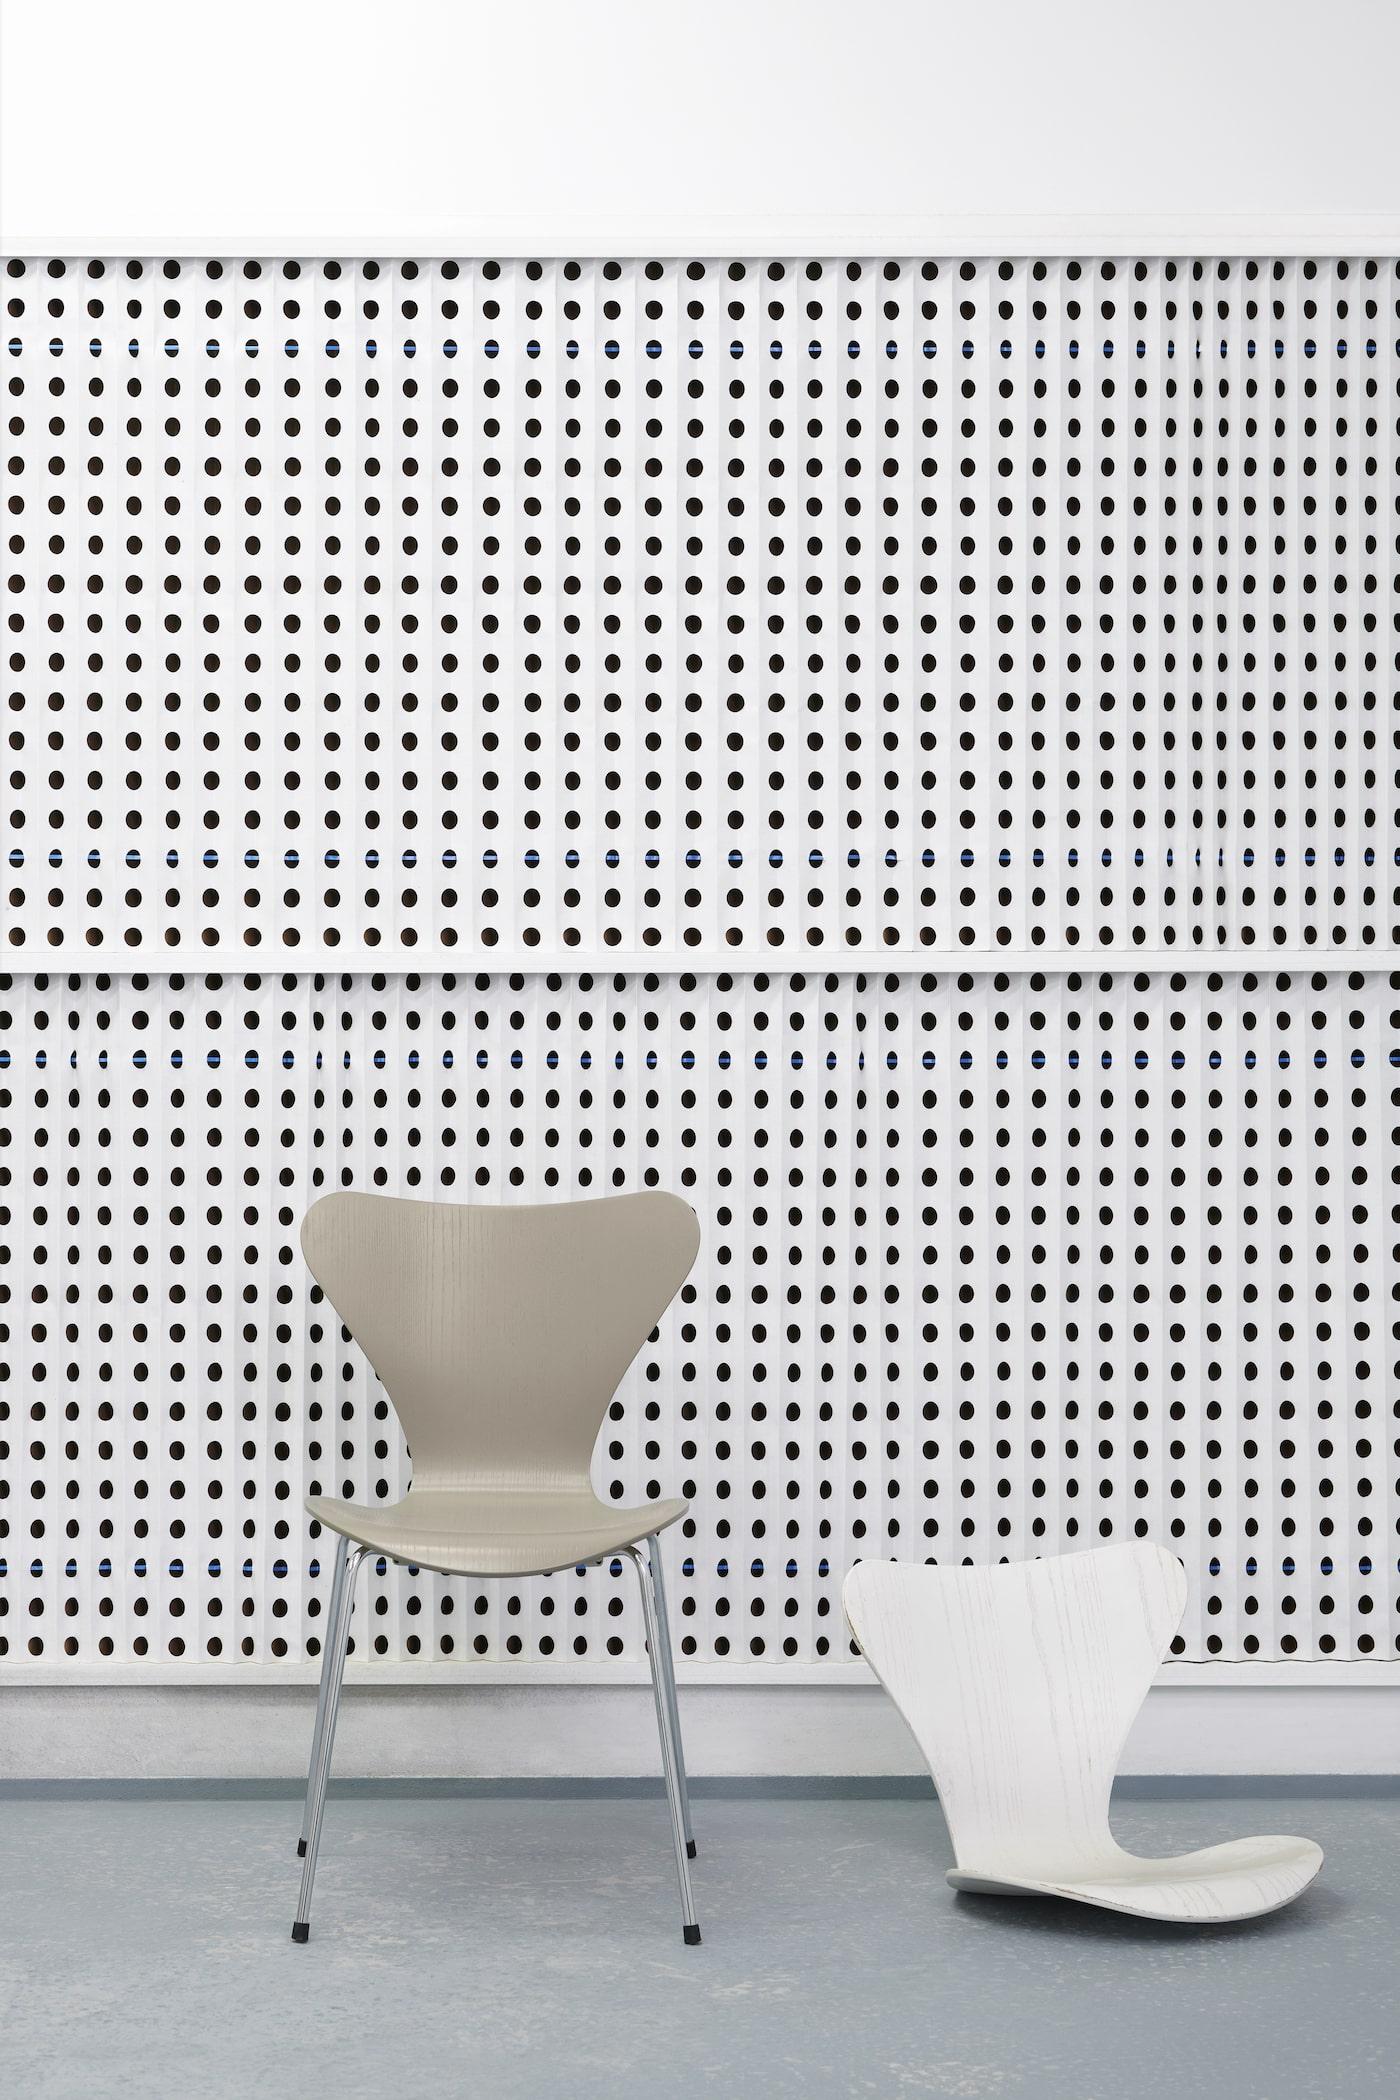 Restored Arne Jacobsen Series 7 chair